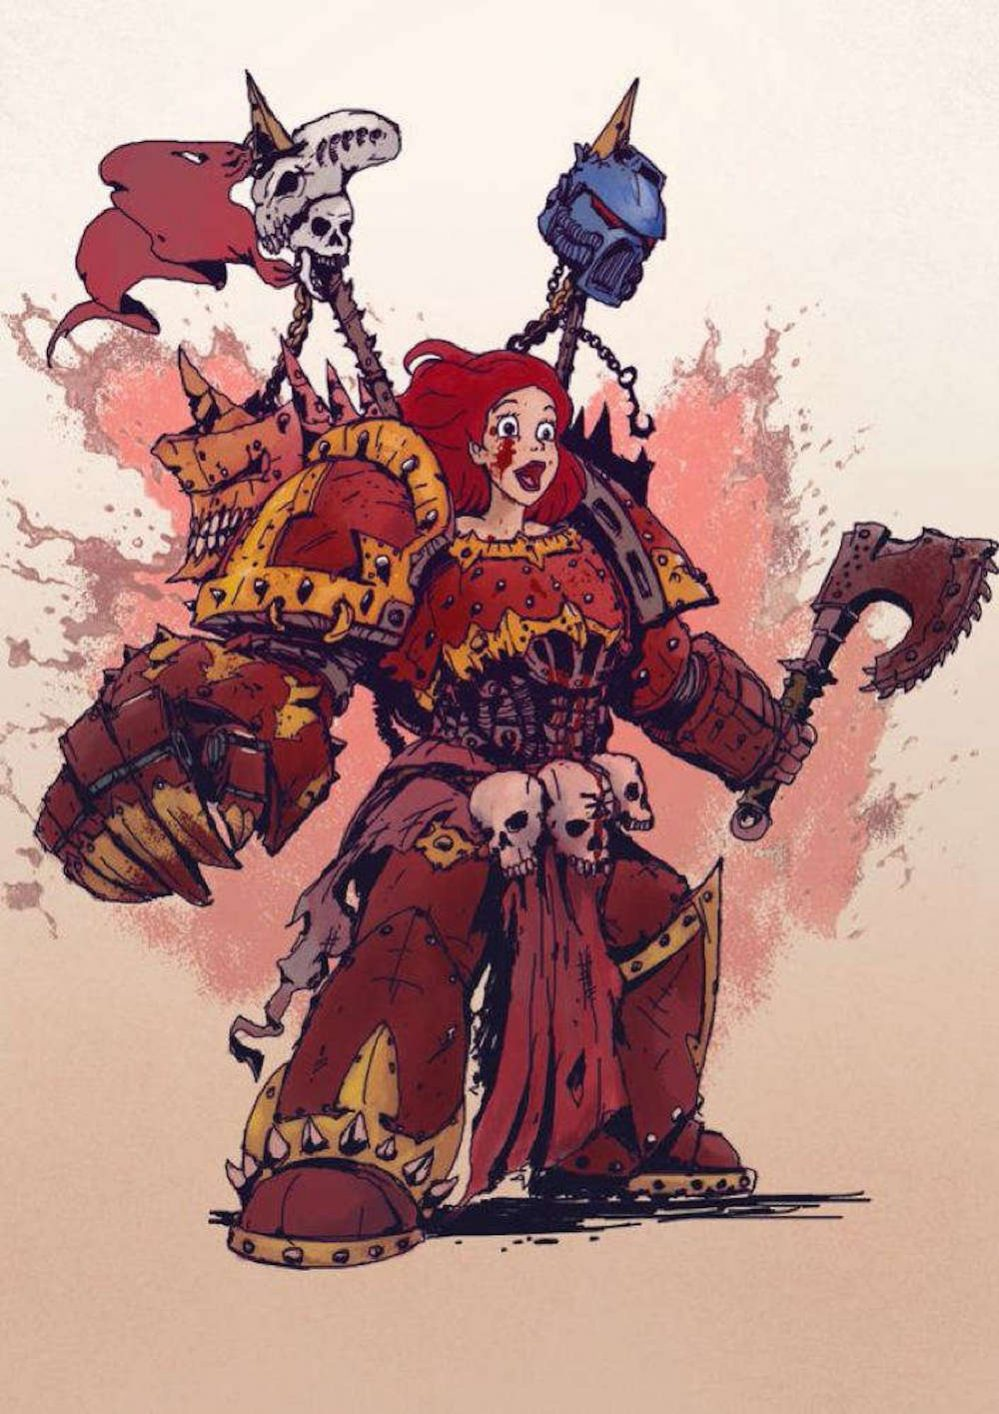 disney-princesses-reimagined-as-badass-warhammer-40k-space-marines